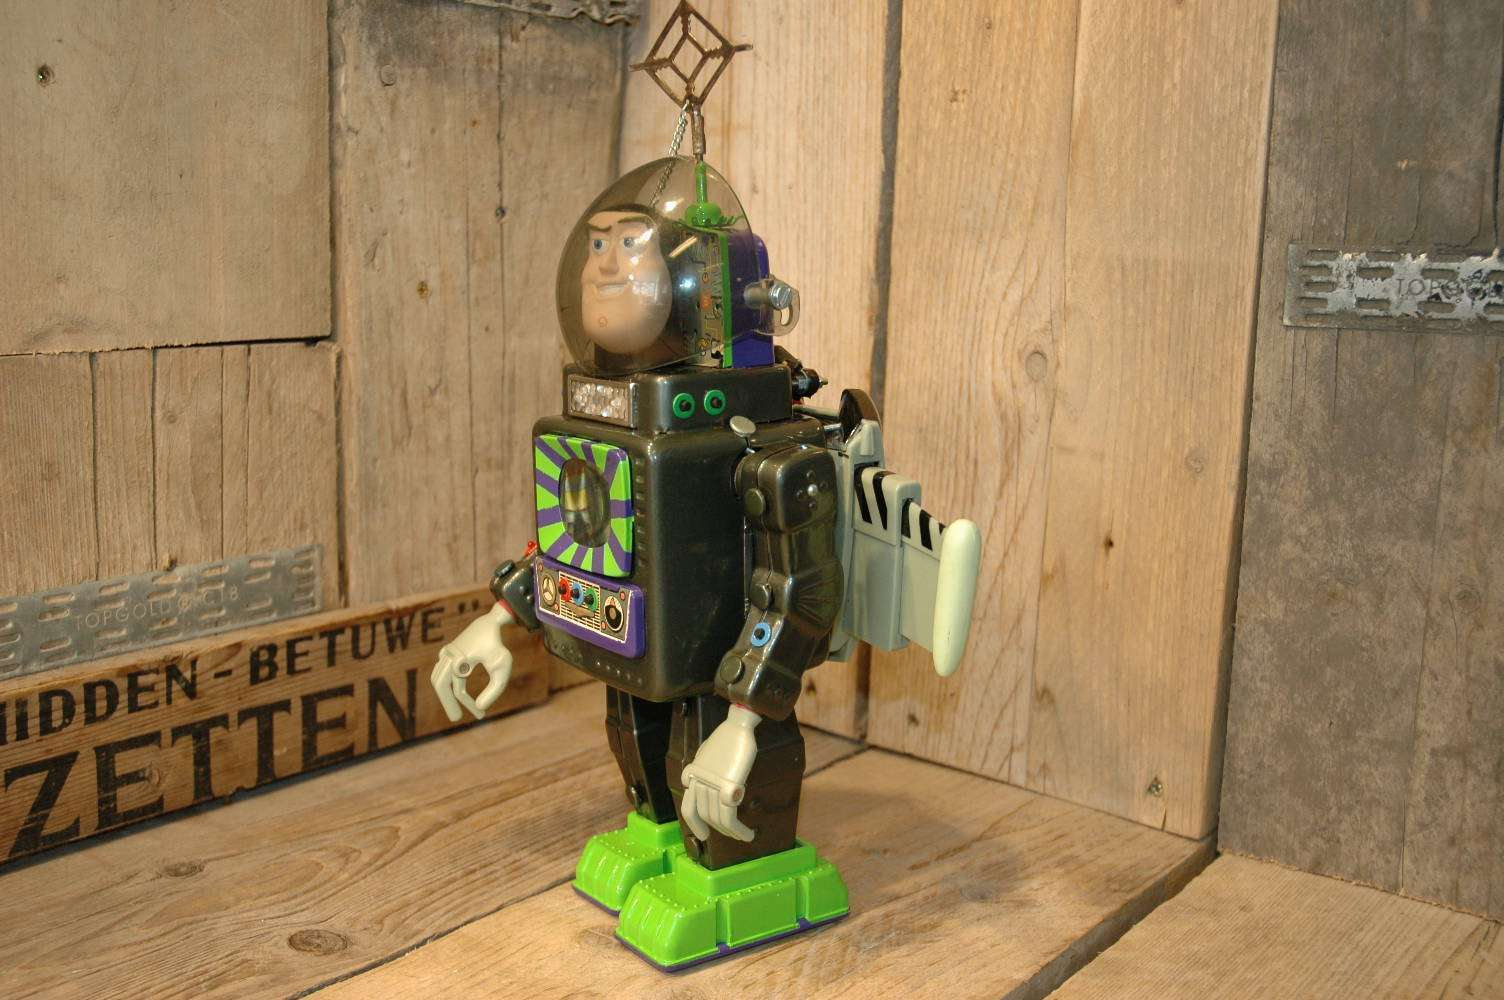 VST- Television Buzz Lightyear II